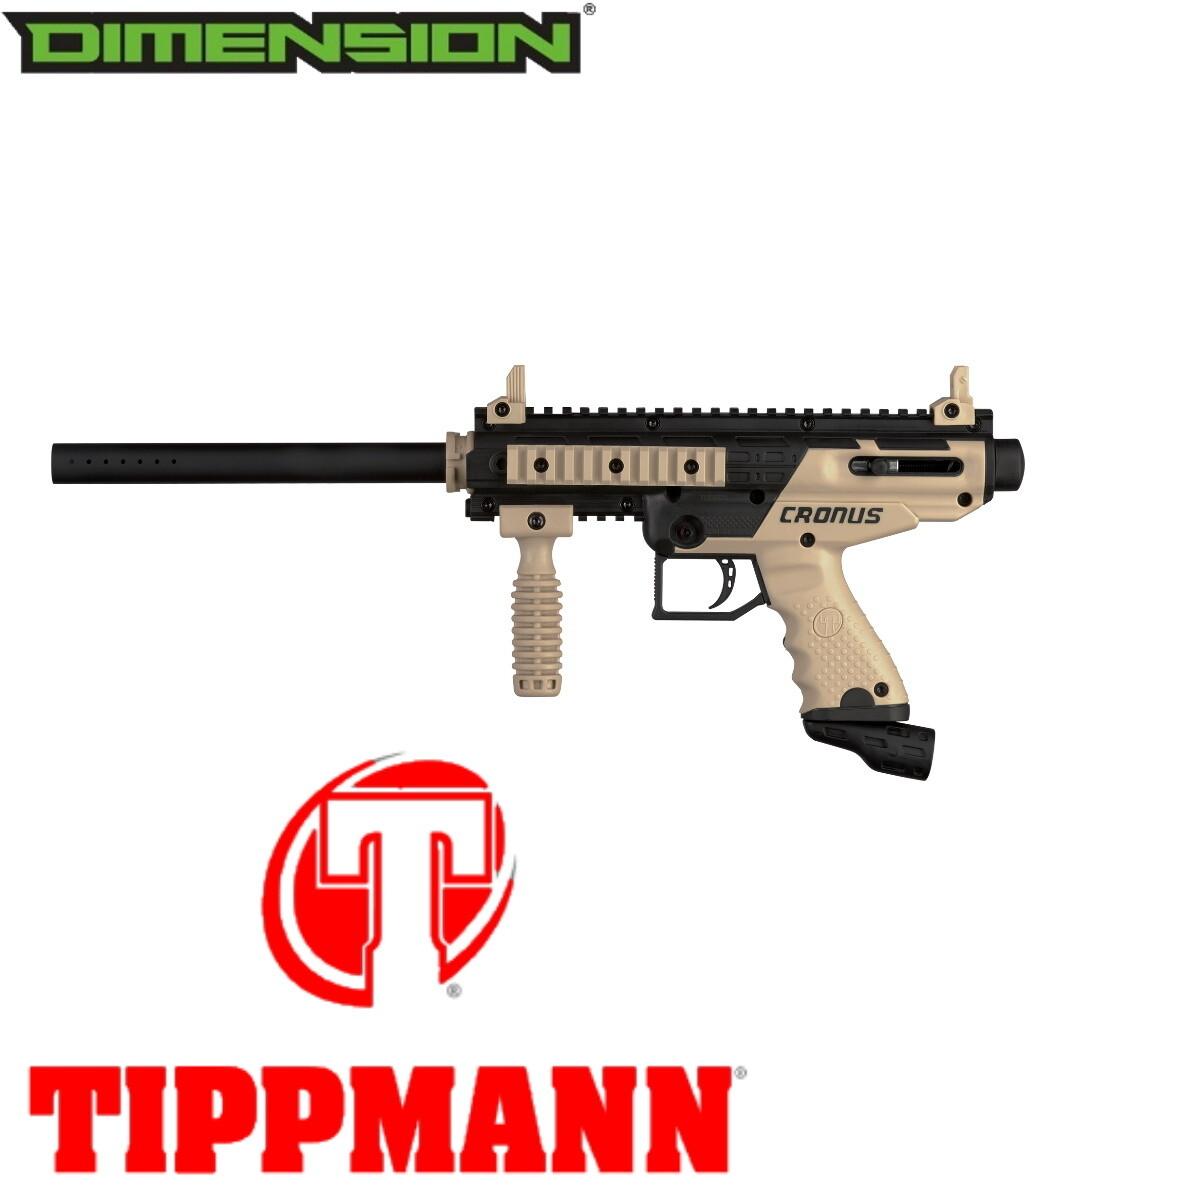 Tippmann Cronus Basic .68 Cal Marker - Black / Tan